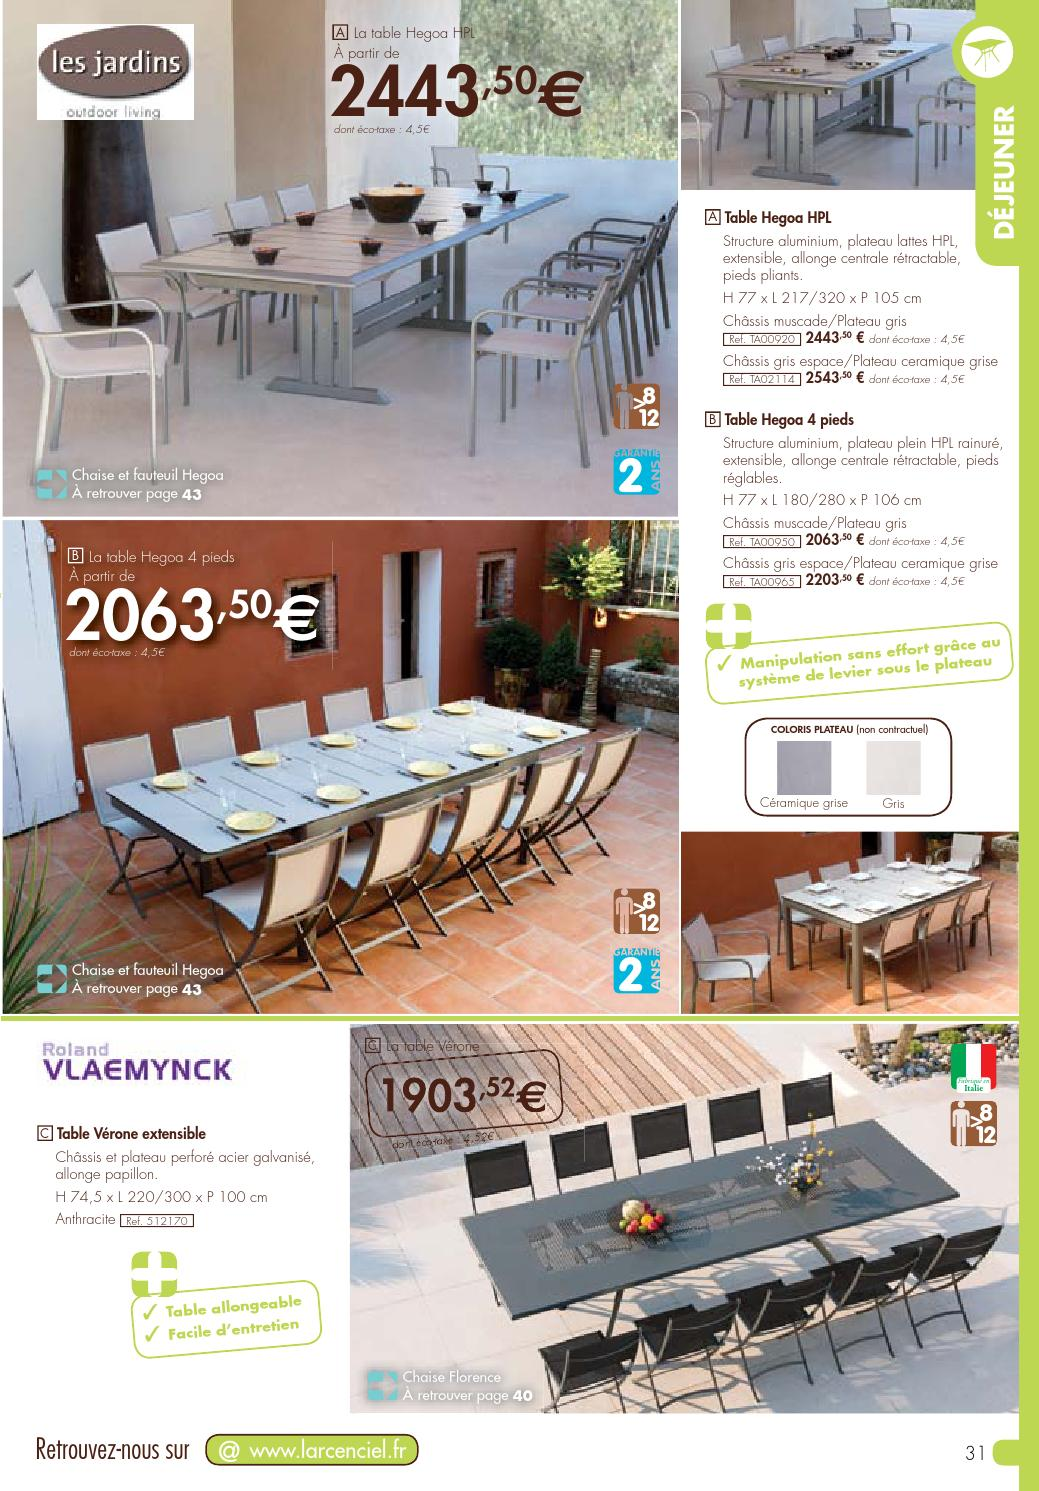 Catalogue Arc En Ciel 2014 by iGLOO - issuu